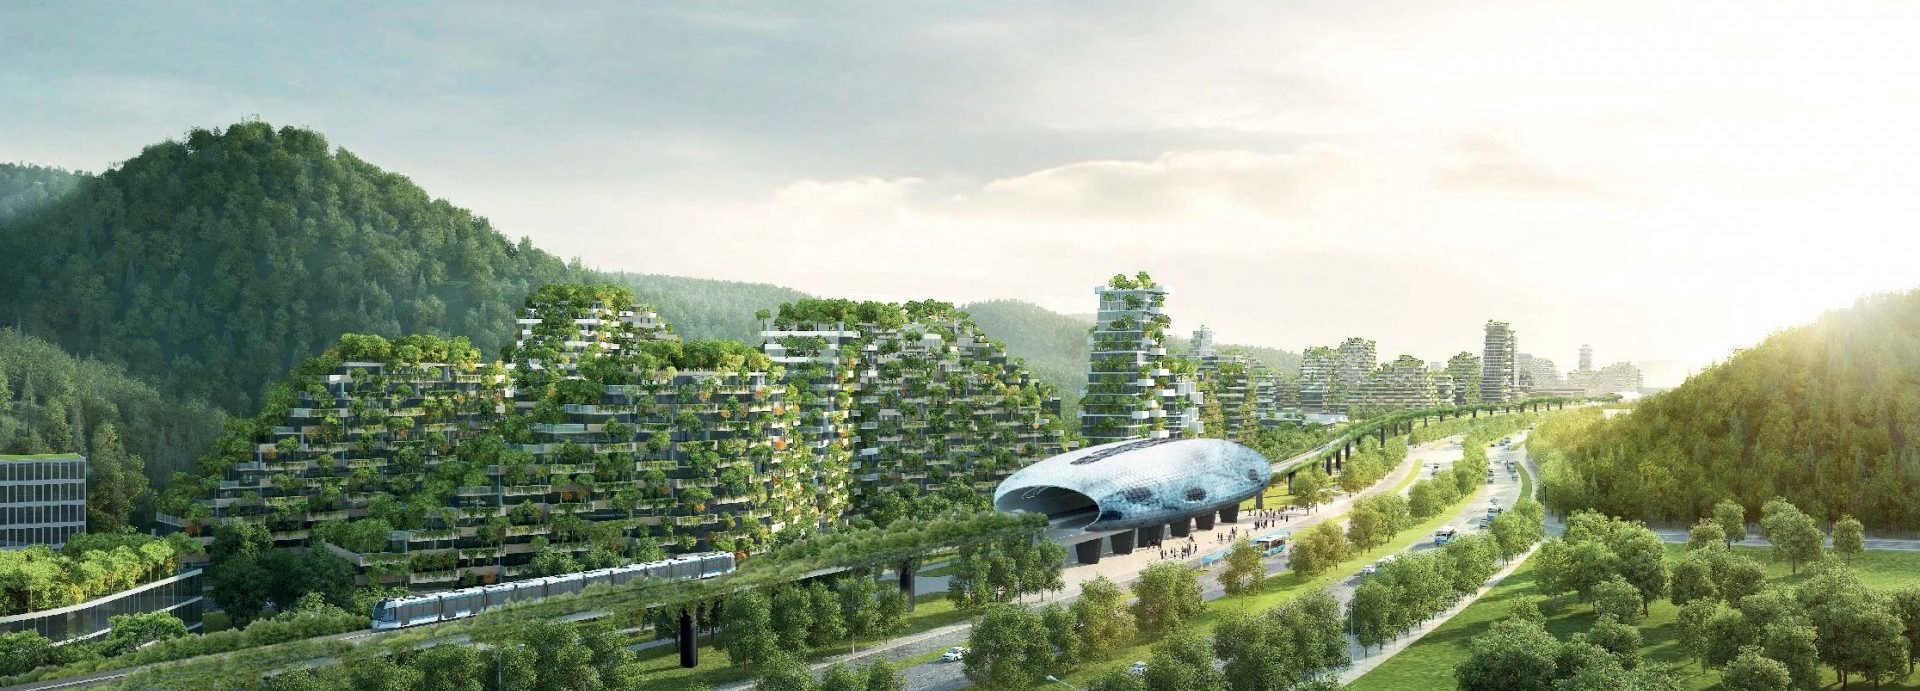 Forest City Liuzhou Stefano Boeri